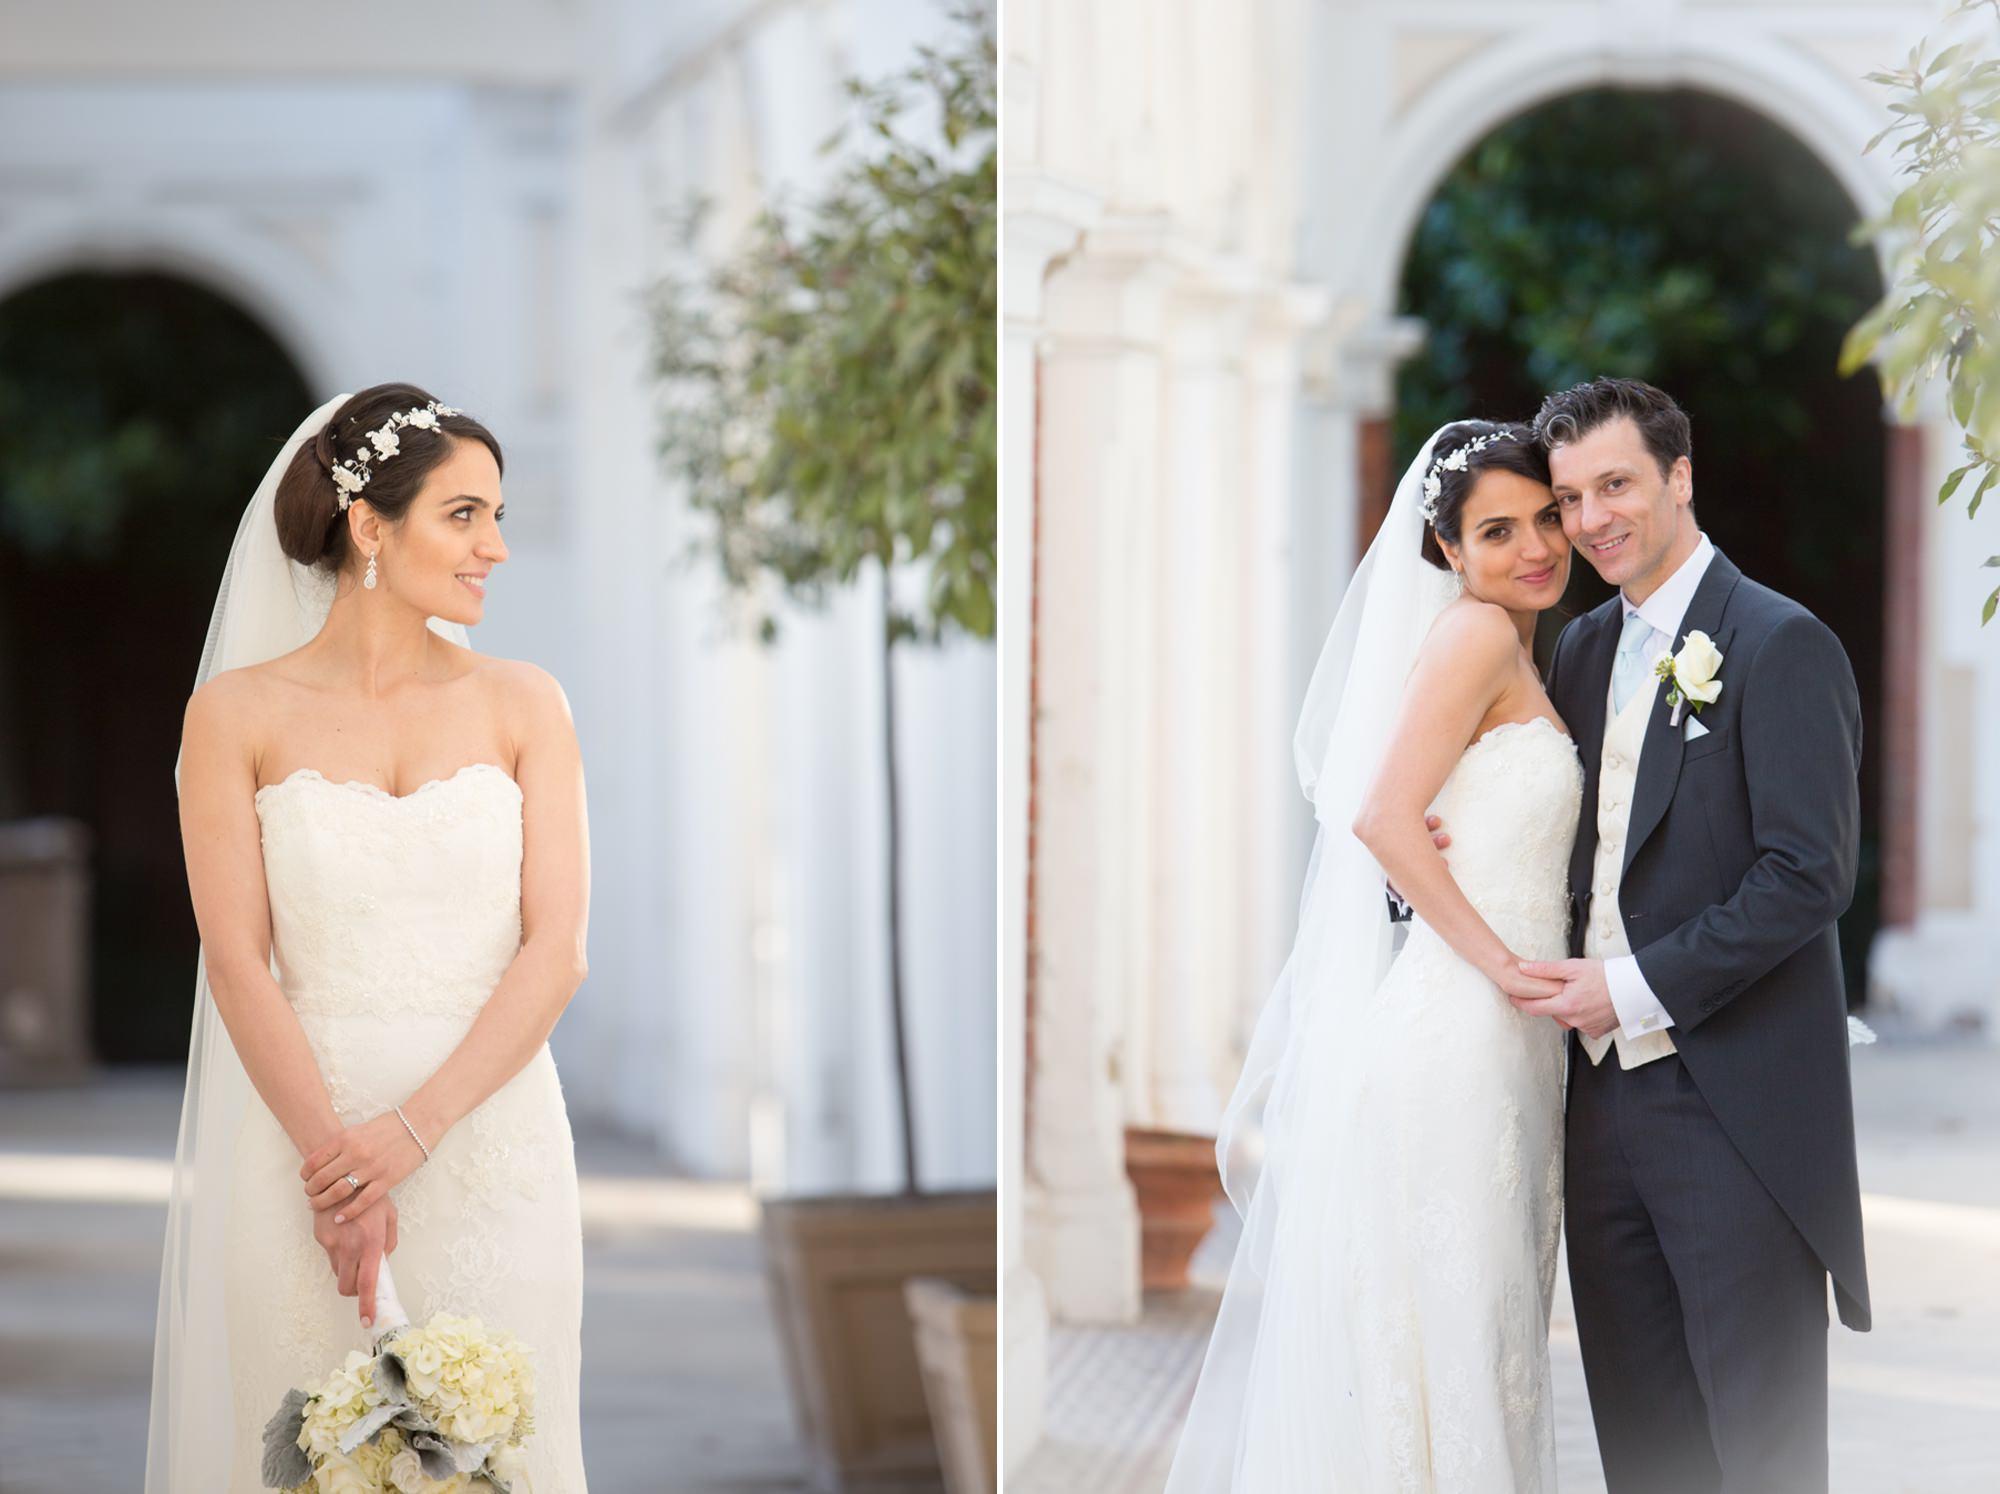 bromley-registry-office-wedding-8